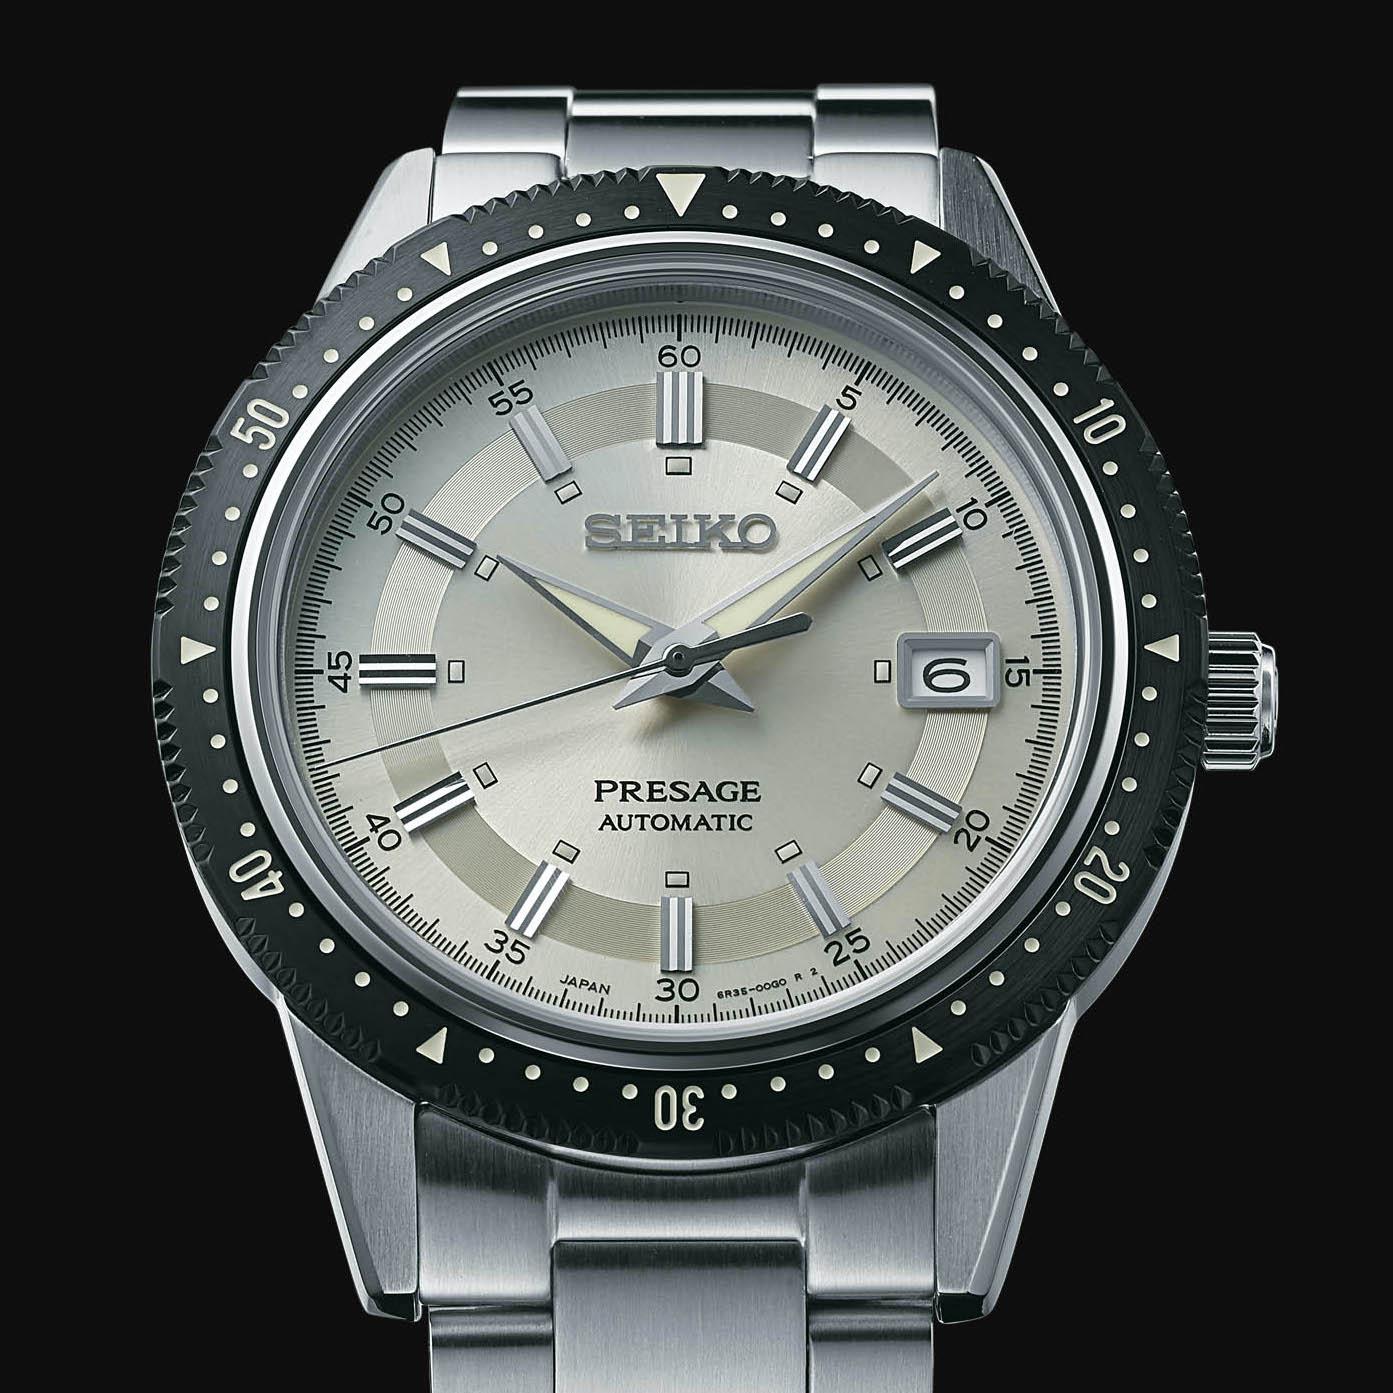 Seiko's new Presage 2020 Limited Edition Seiko-Presage-2020-Limited-Edition-SPB127J1-Tribute-1964-Crown-Chronograph-4